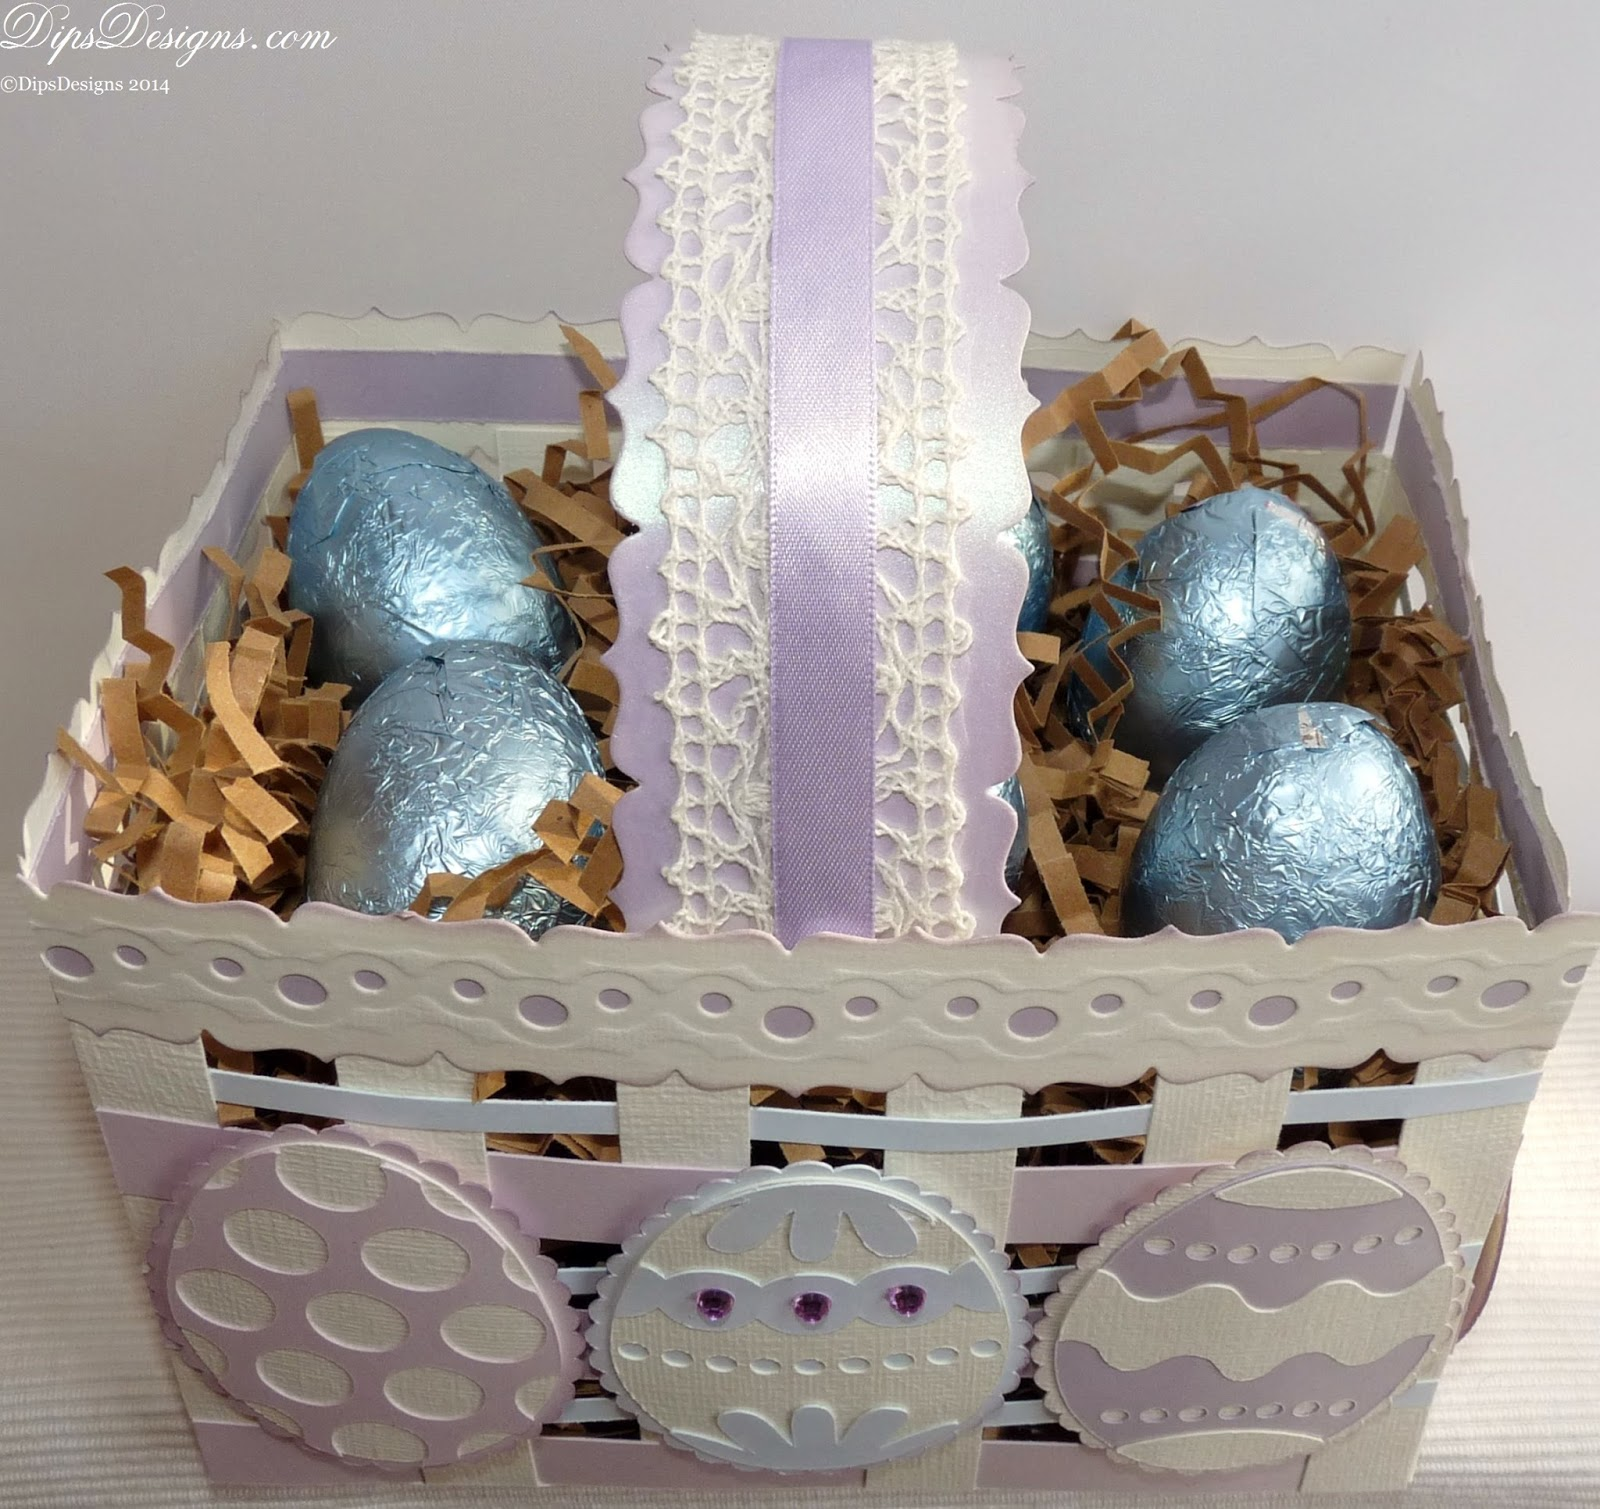 Handmade Woven Easter Basket Project